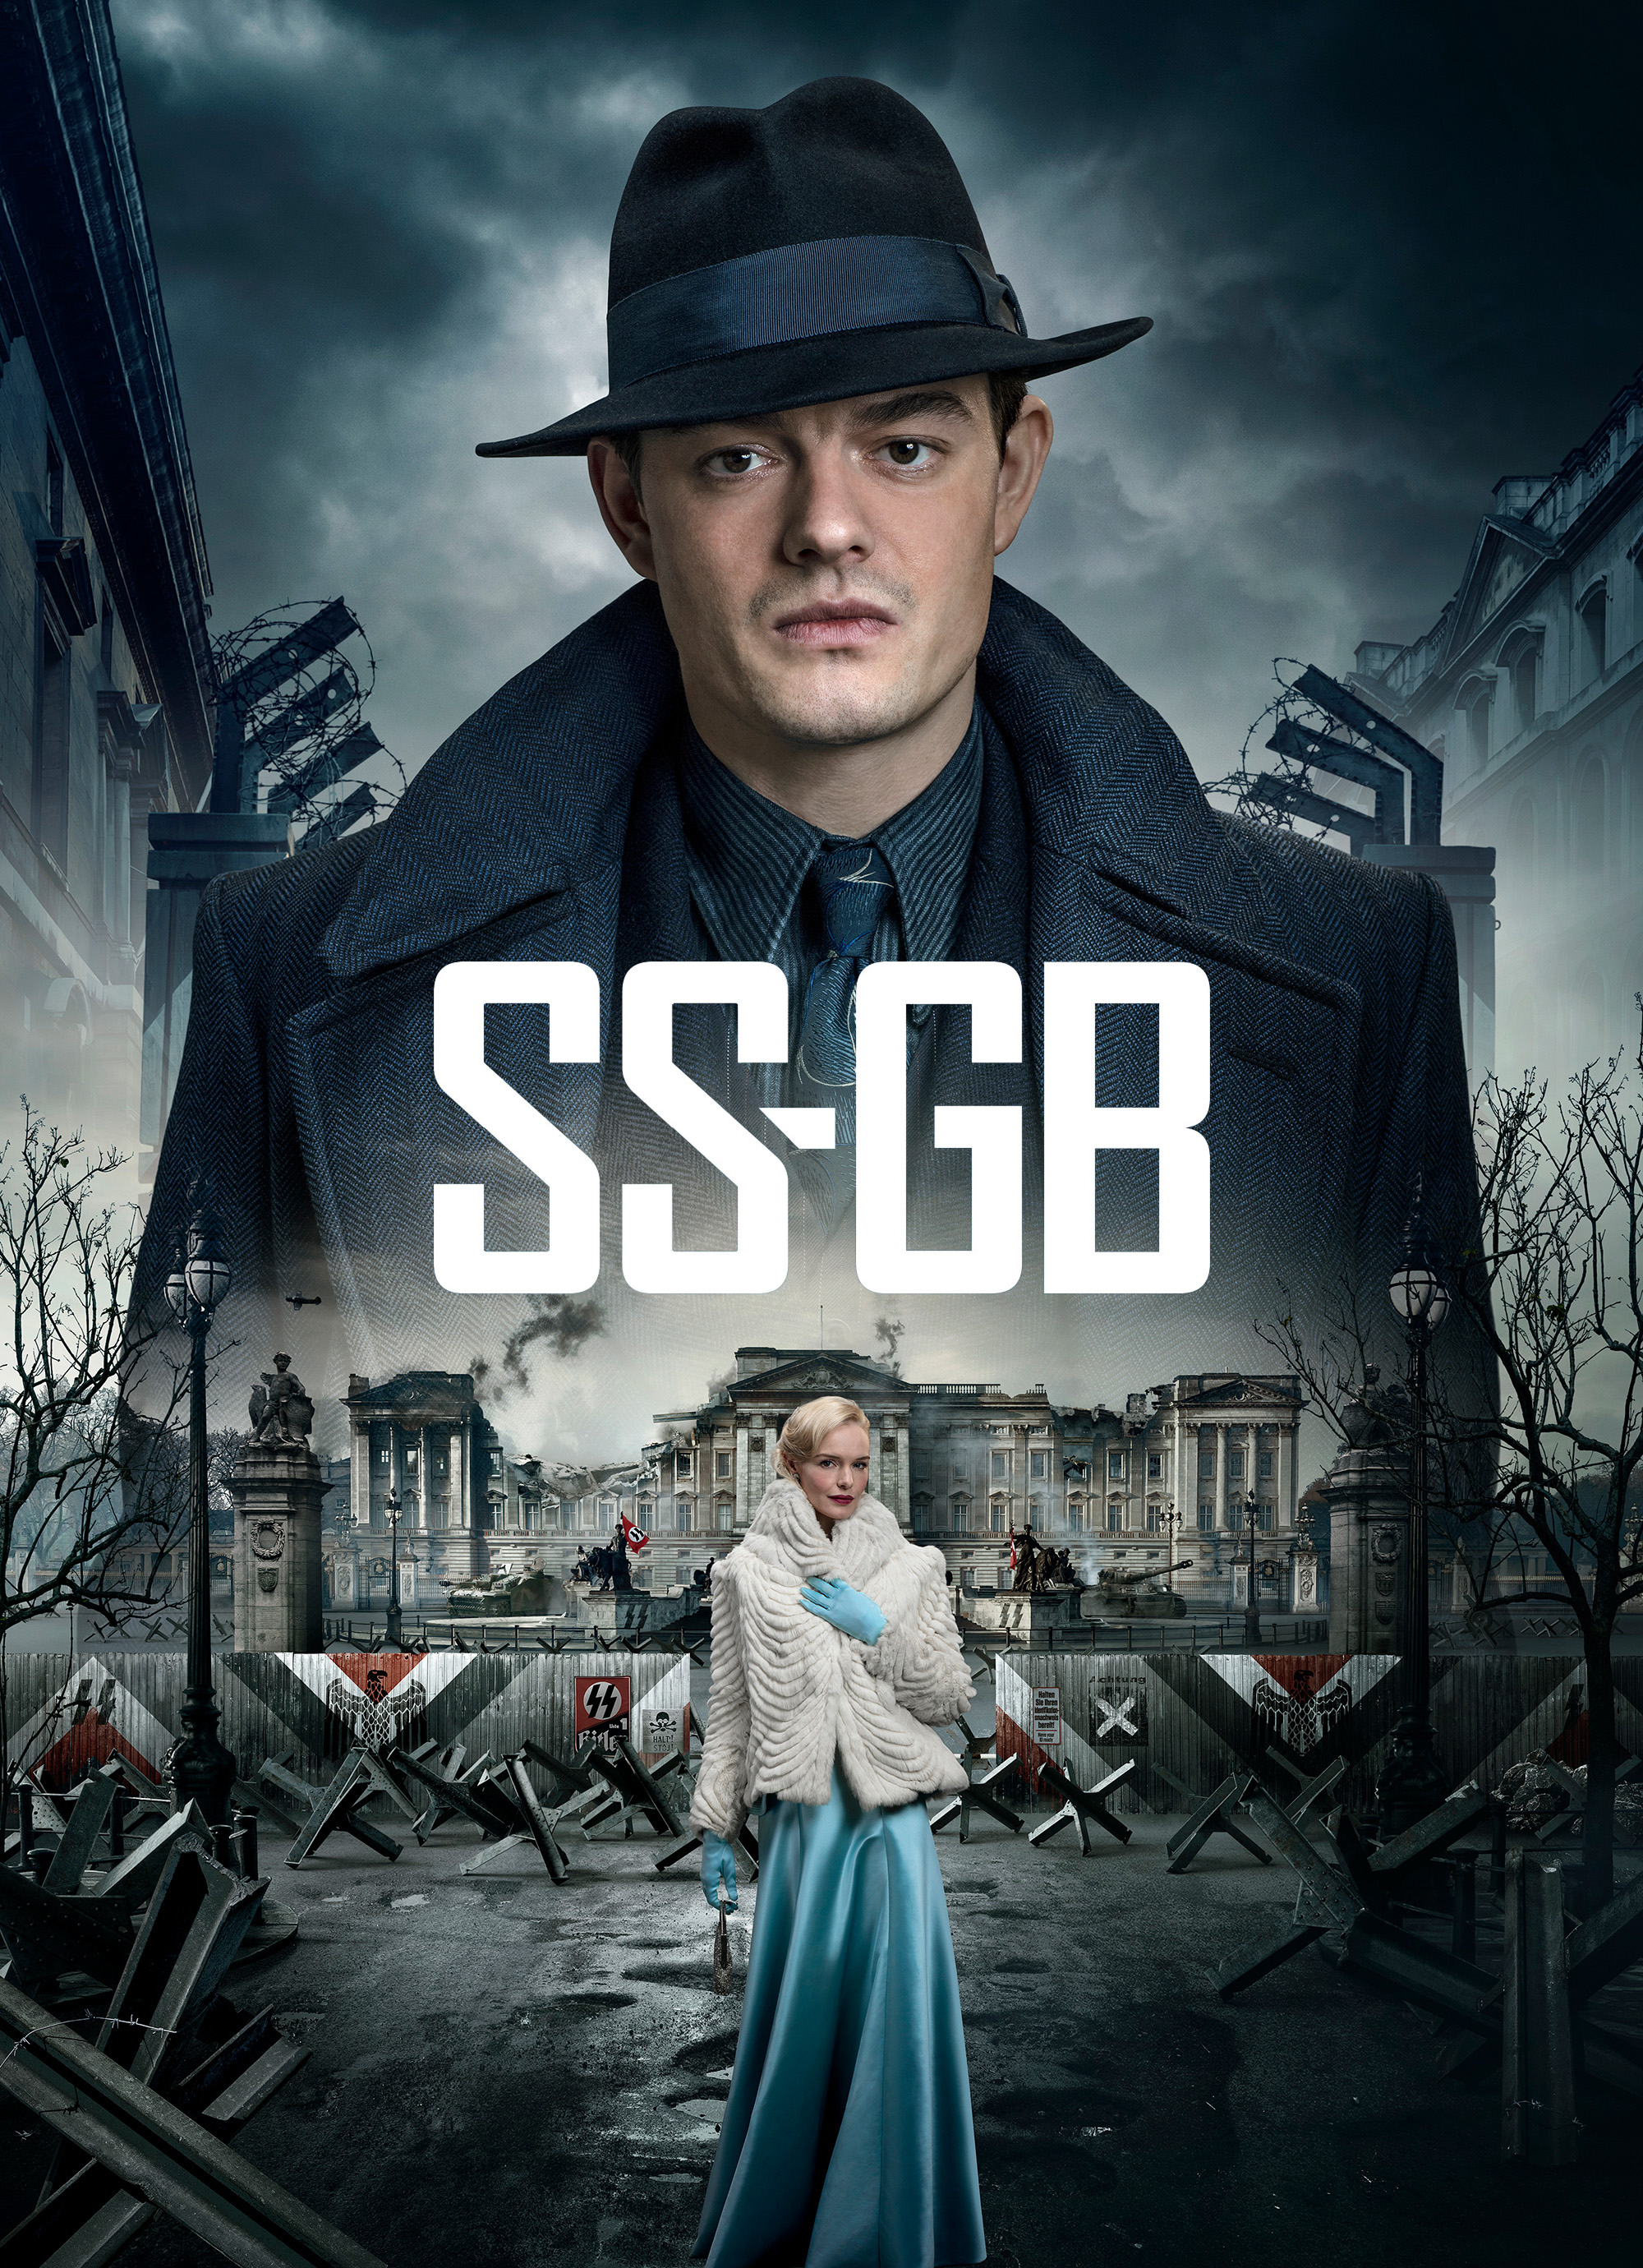 BBC SS-GB